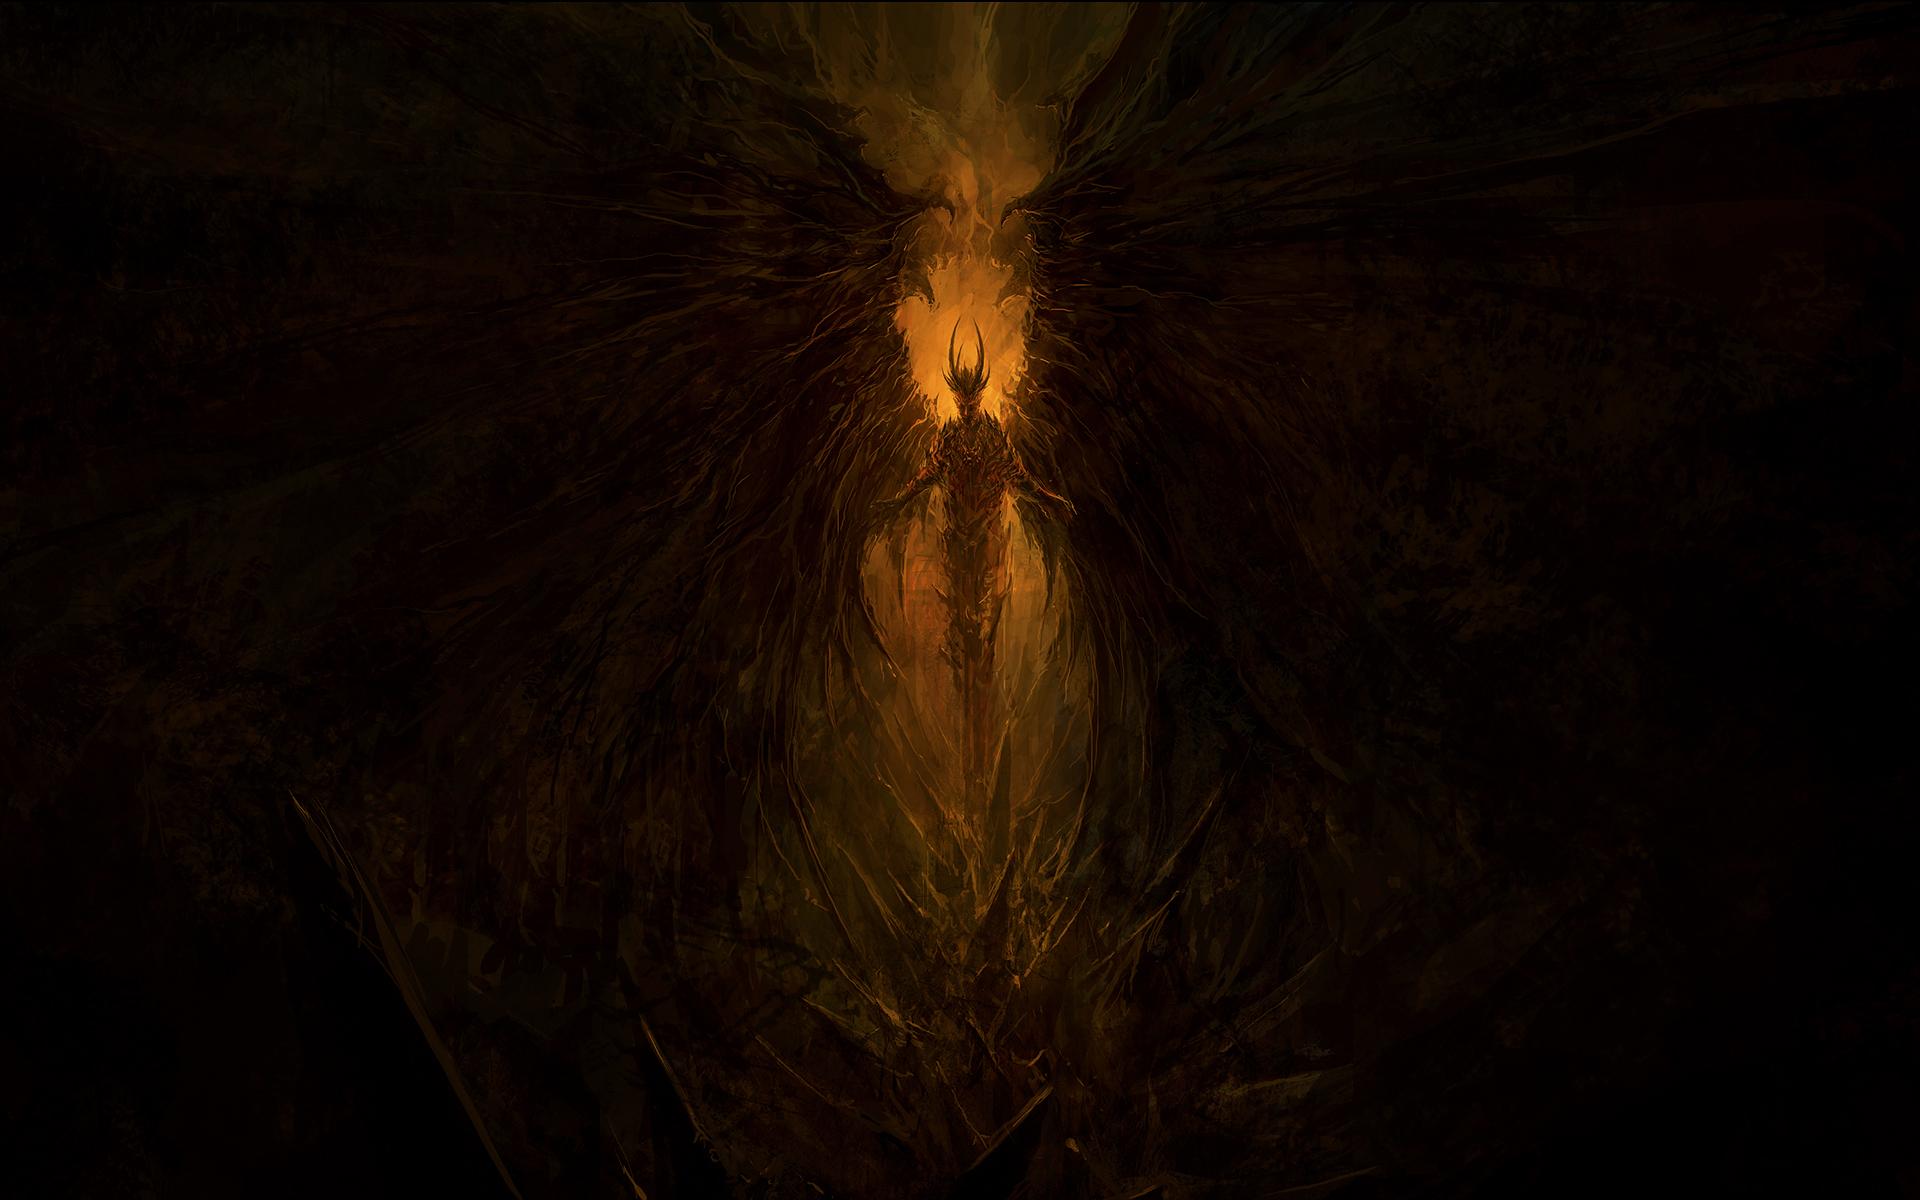 Demon Drawing Creepy Devil occult evil wallpaper 1920x1200 55649 1920x1200